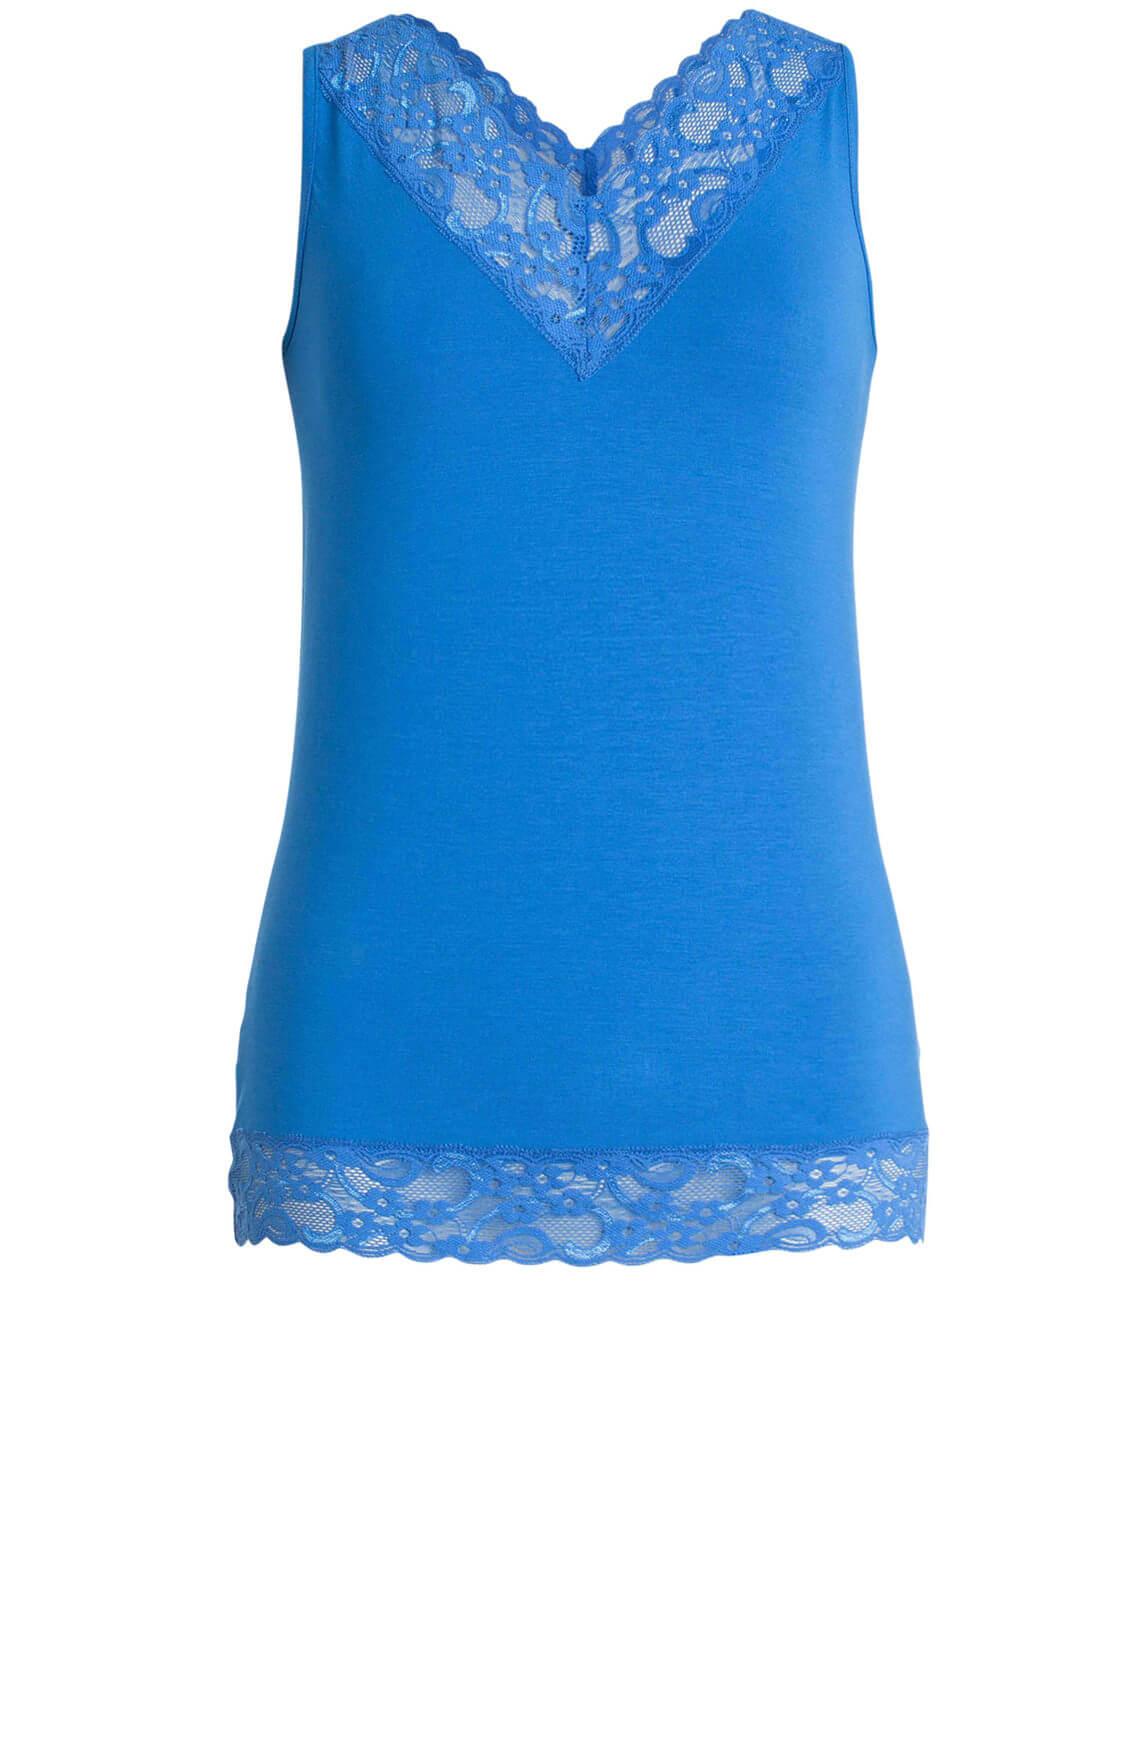 Anna Dames Top met kant Blauw